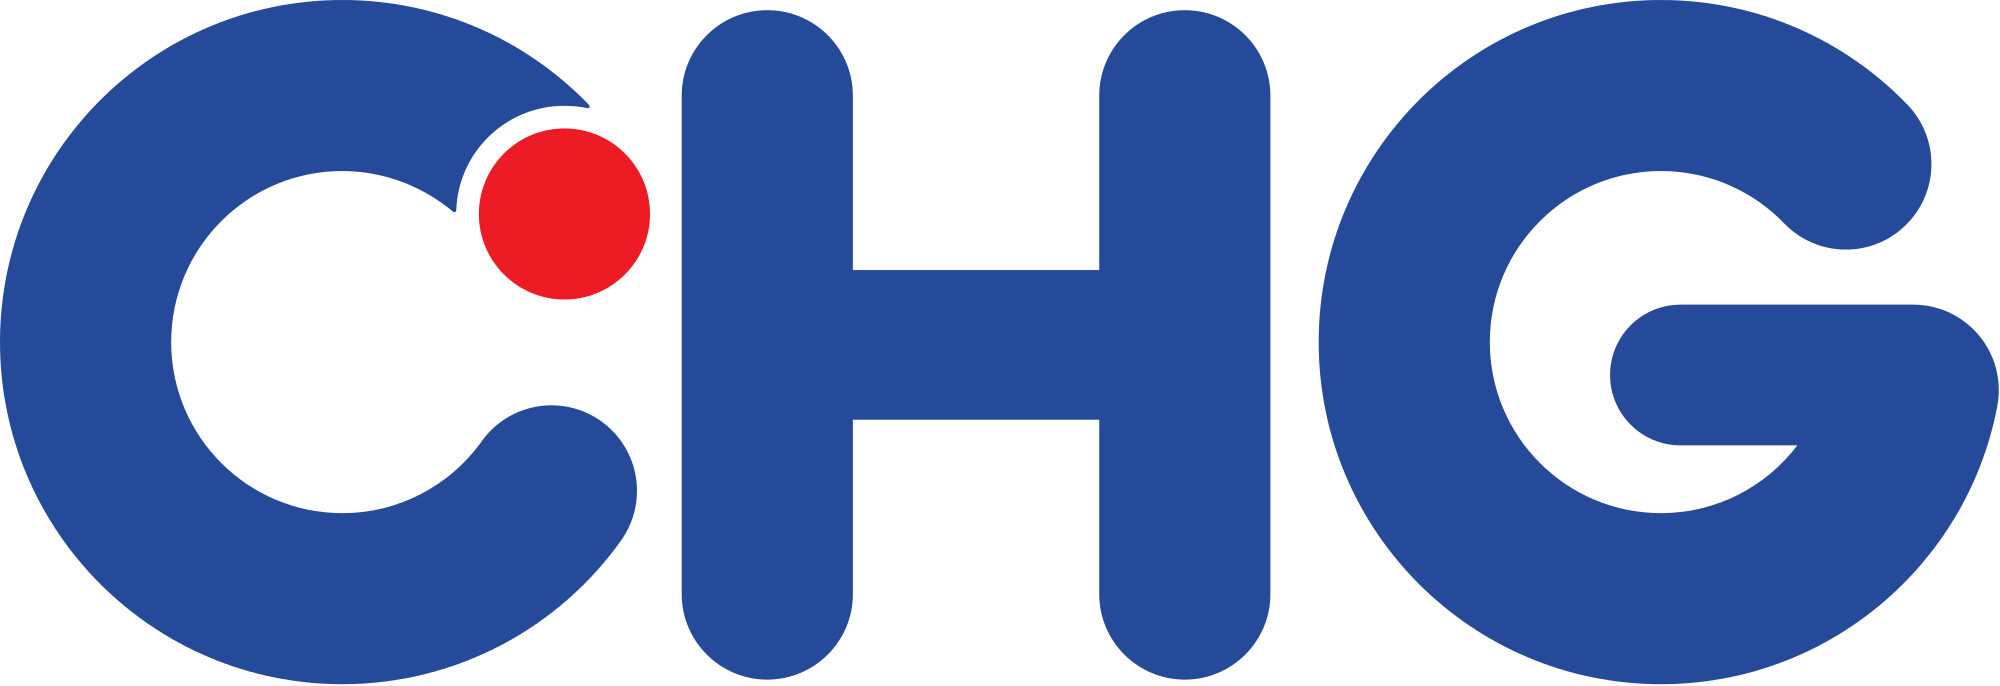 CHG-MERIDIAN AGLogo Image